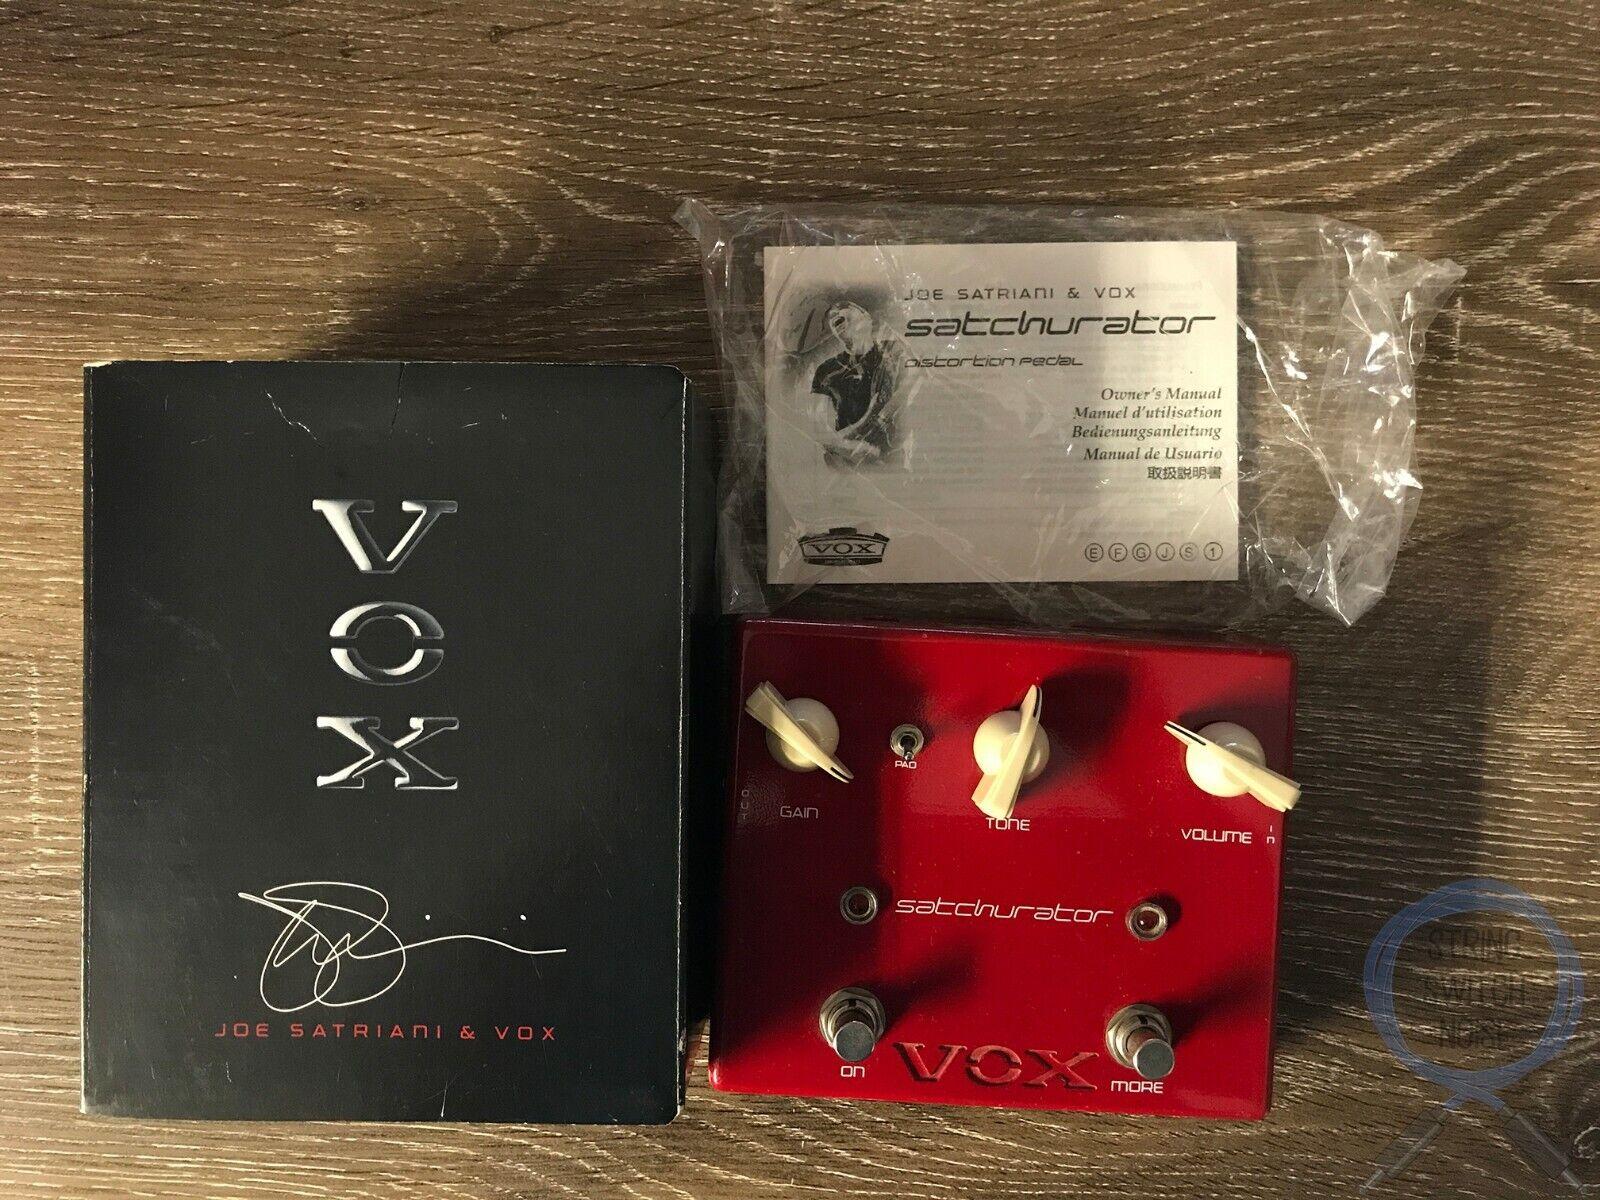 Vox JS-DS, Satchurator, Distortion, Boost, Original Boxing, Guitar Effect Pedal